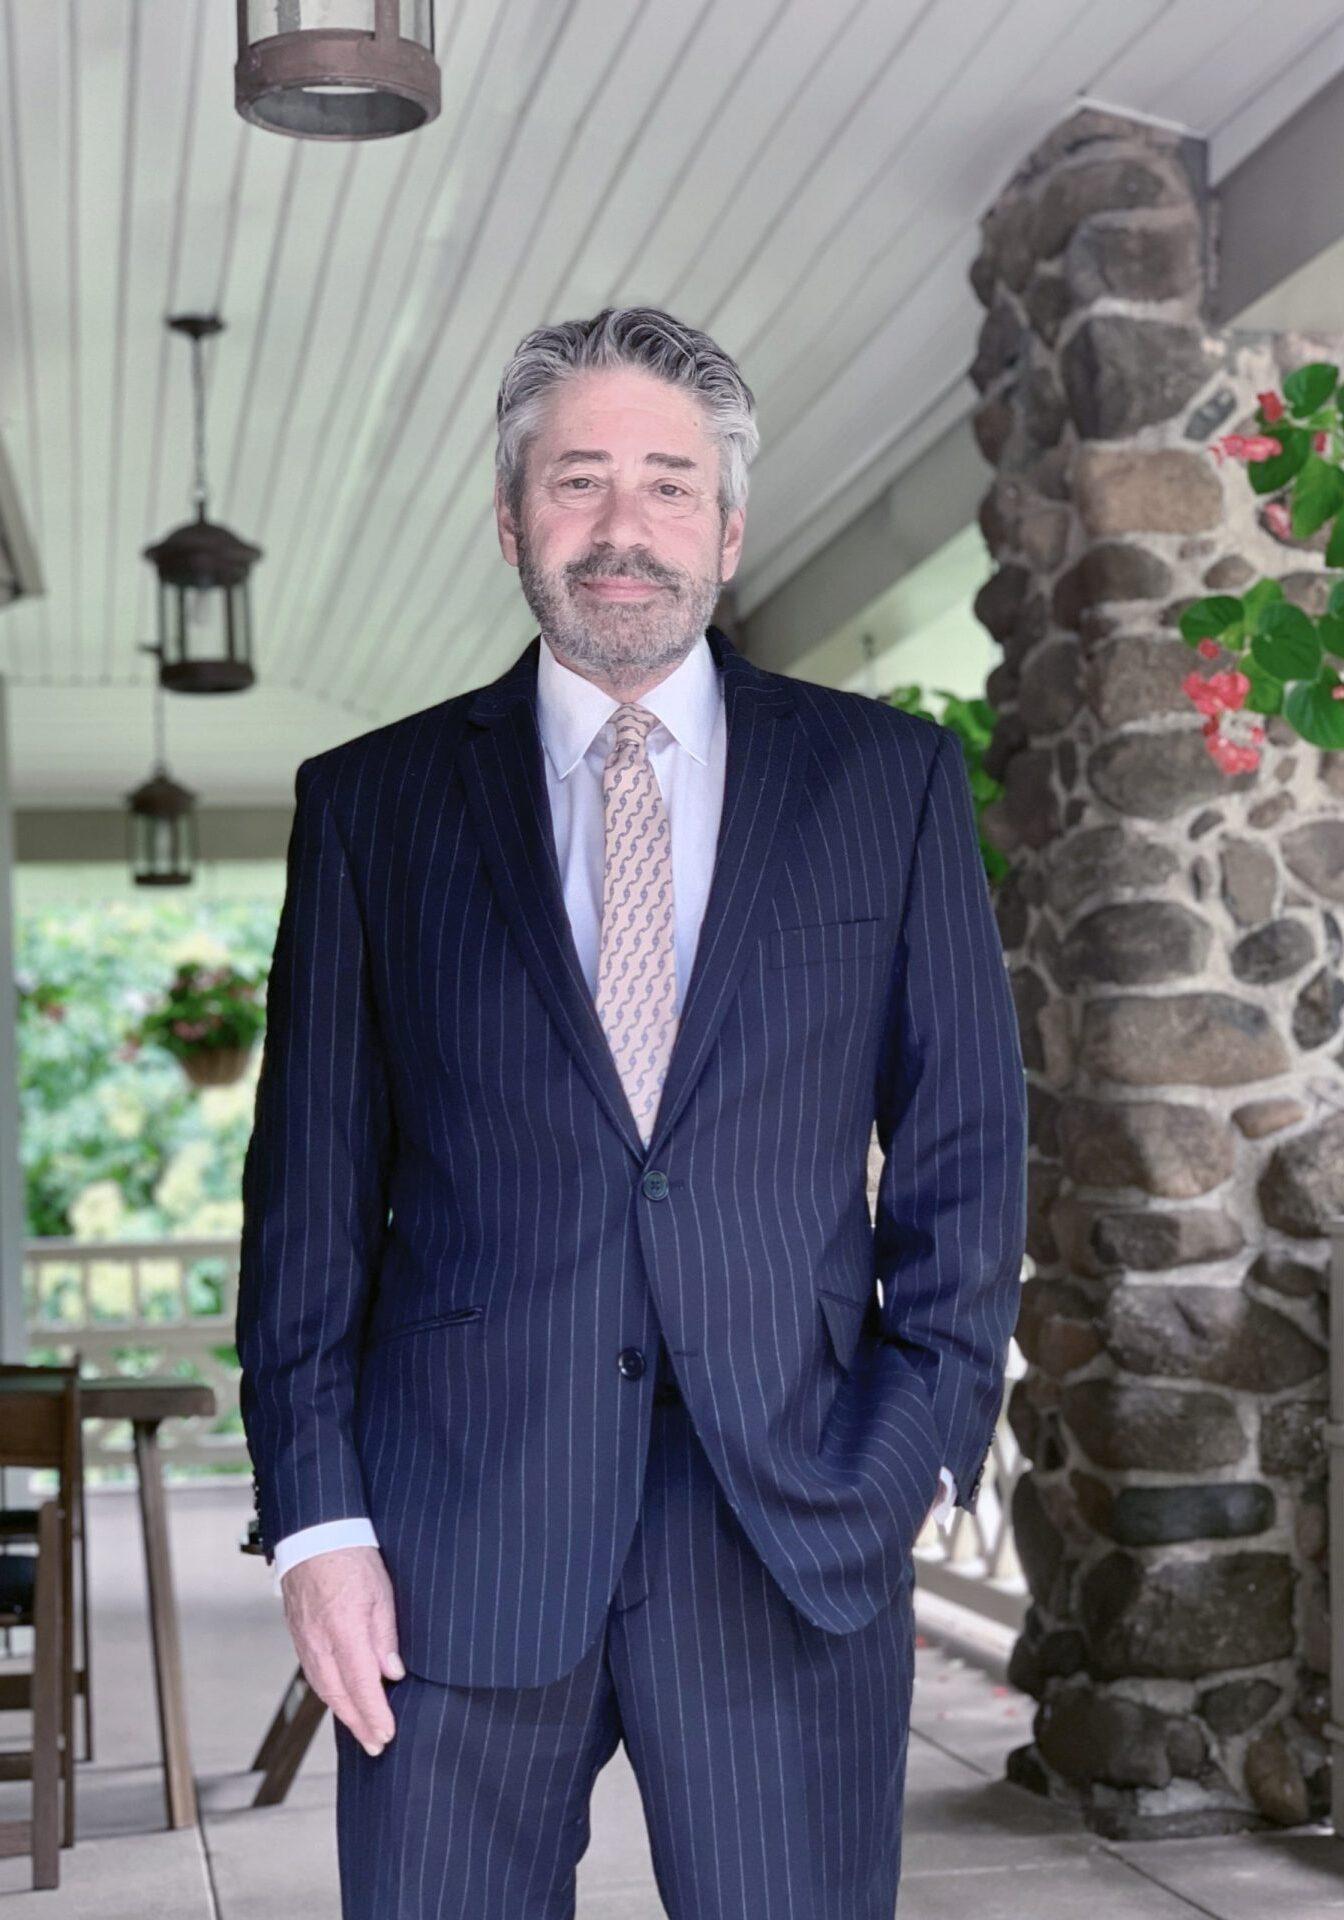 Attorney Jeffrey Sachs Profile softened